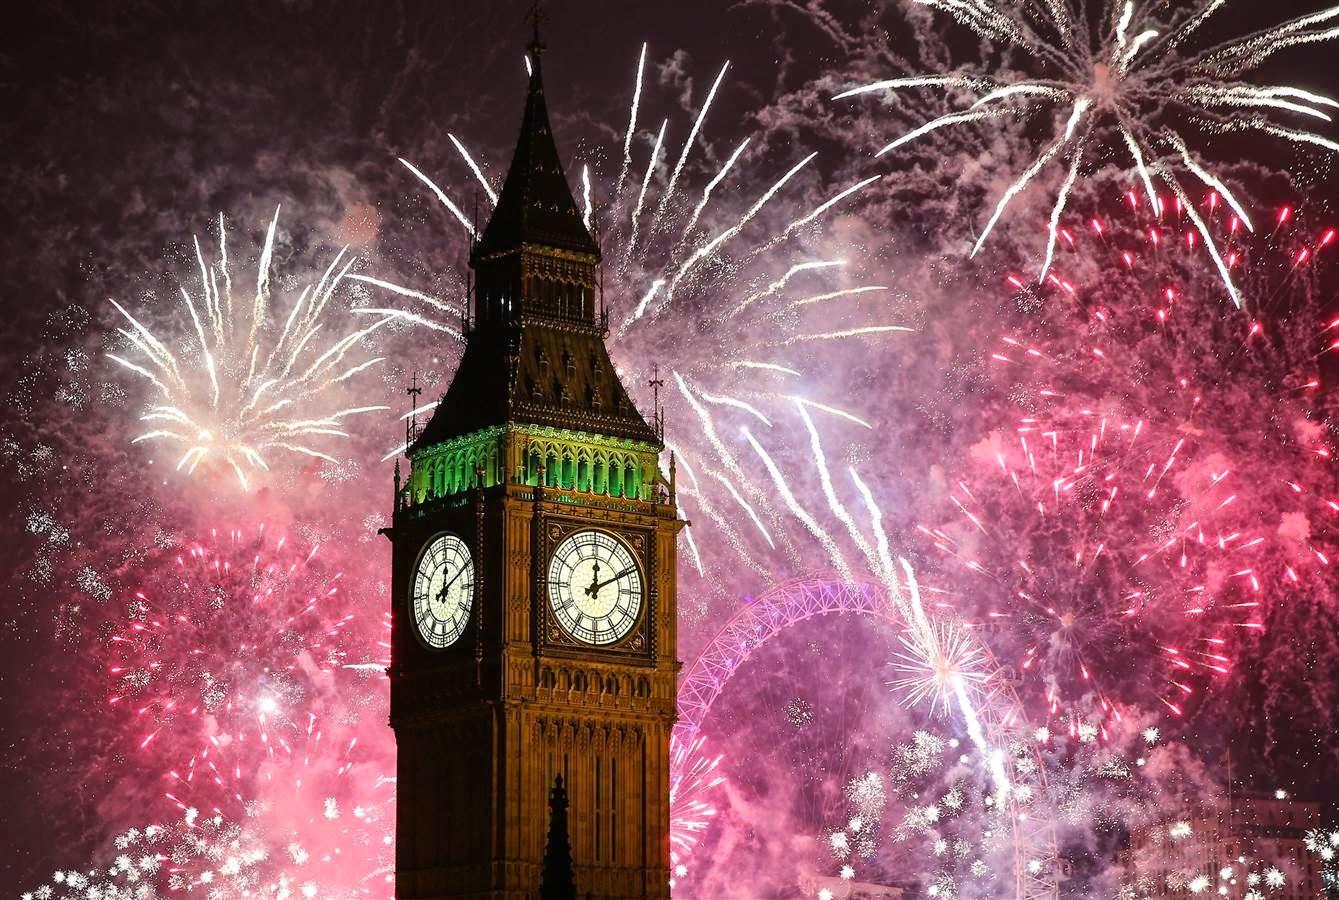 Pertunjukan kembang api menghiasi langit kota London